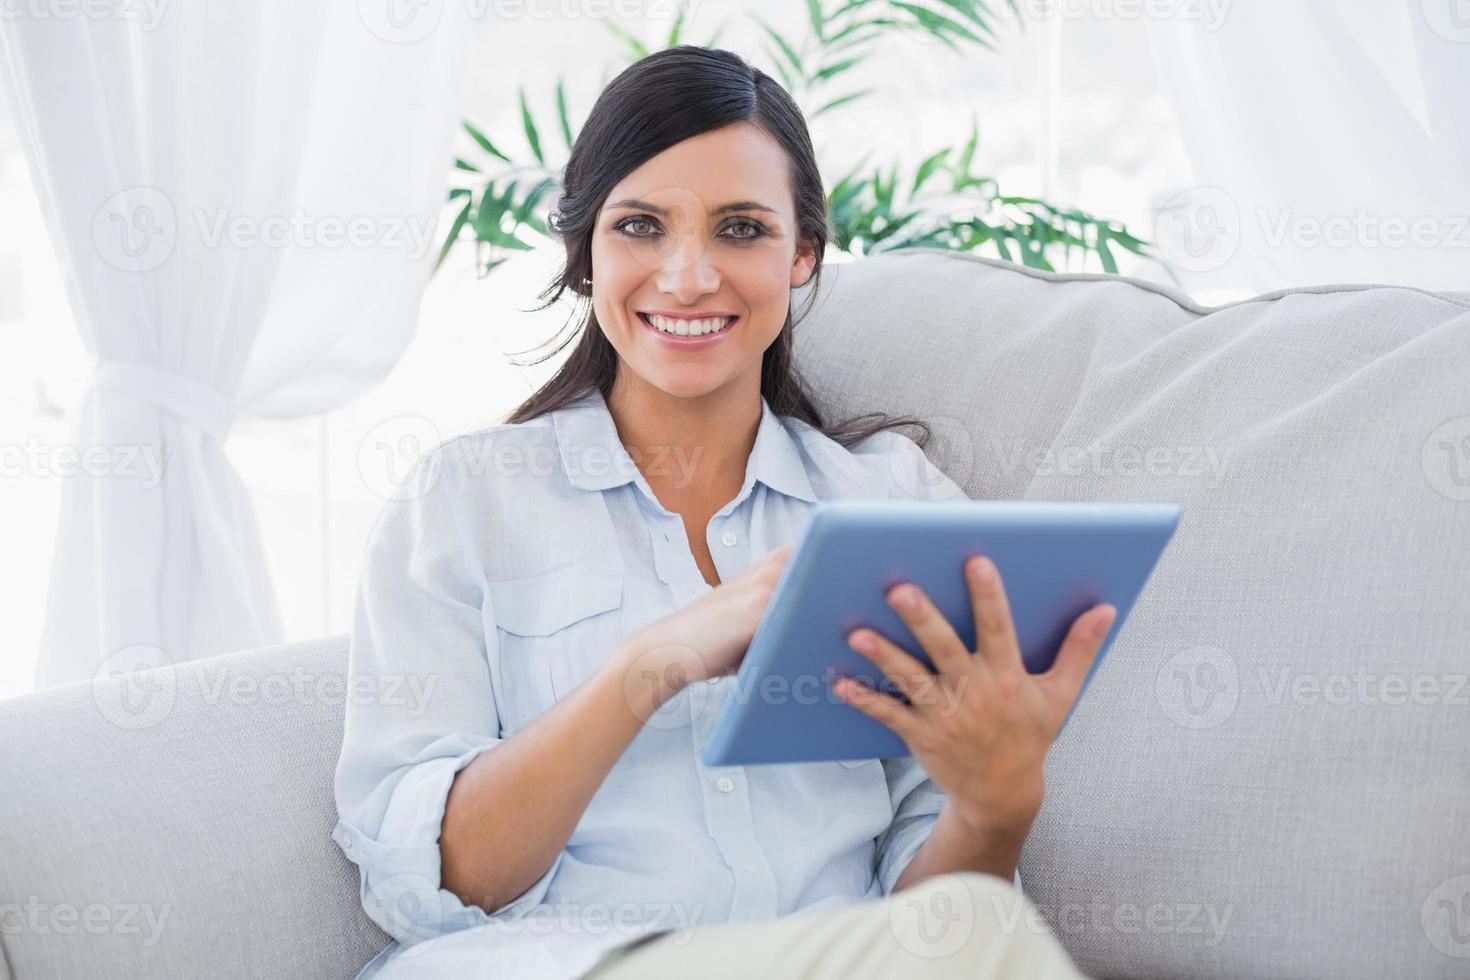 bruna allegra con tablet pc foto